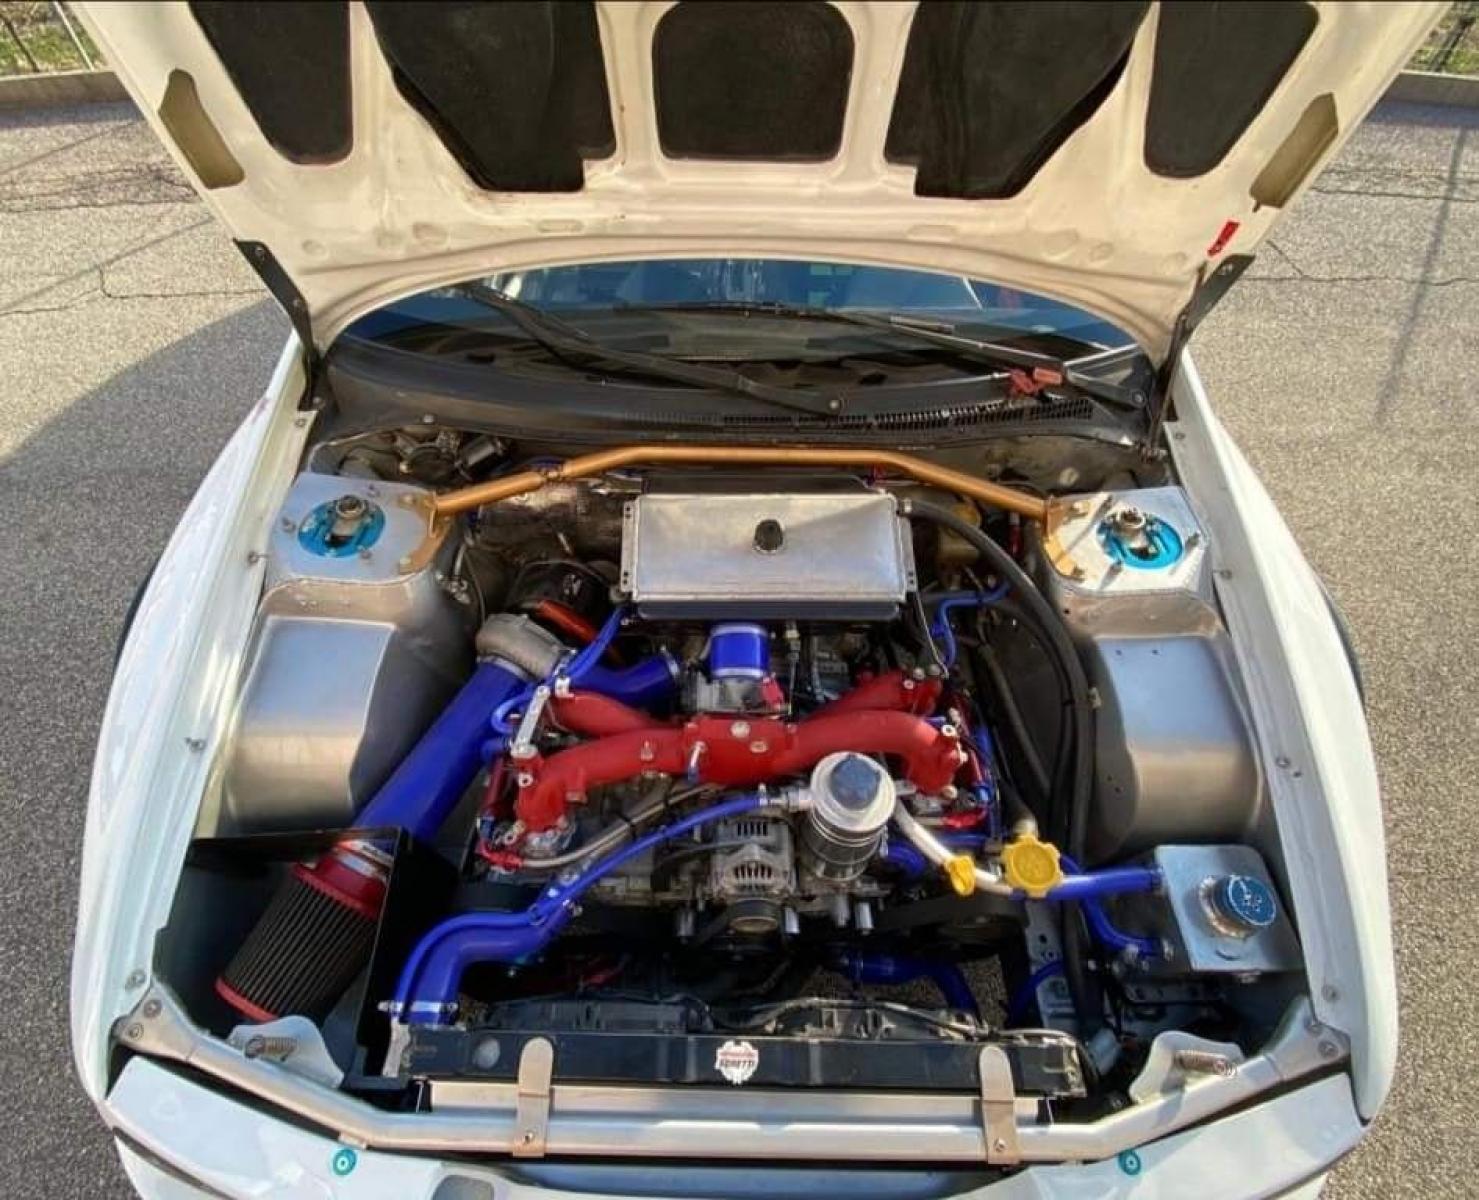 Subaru Impreza mod. WRX - 1